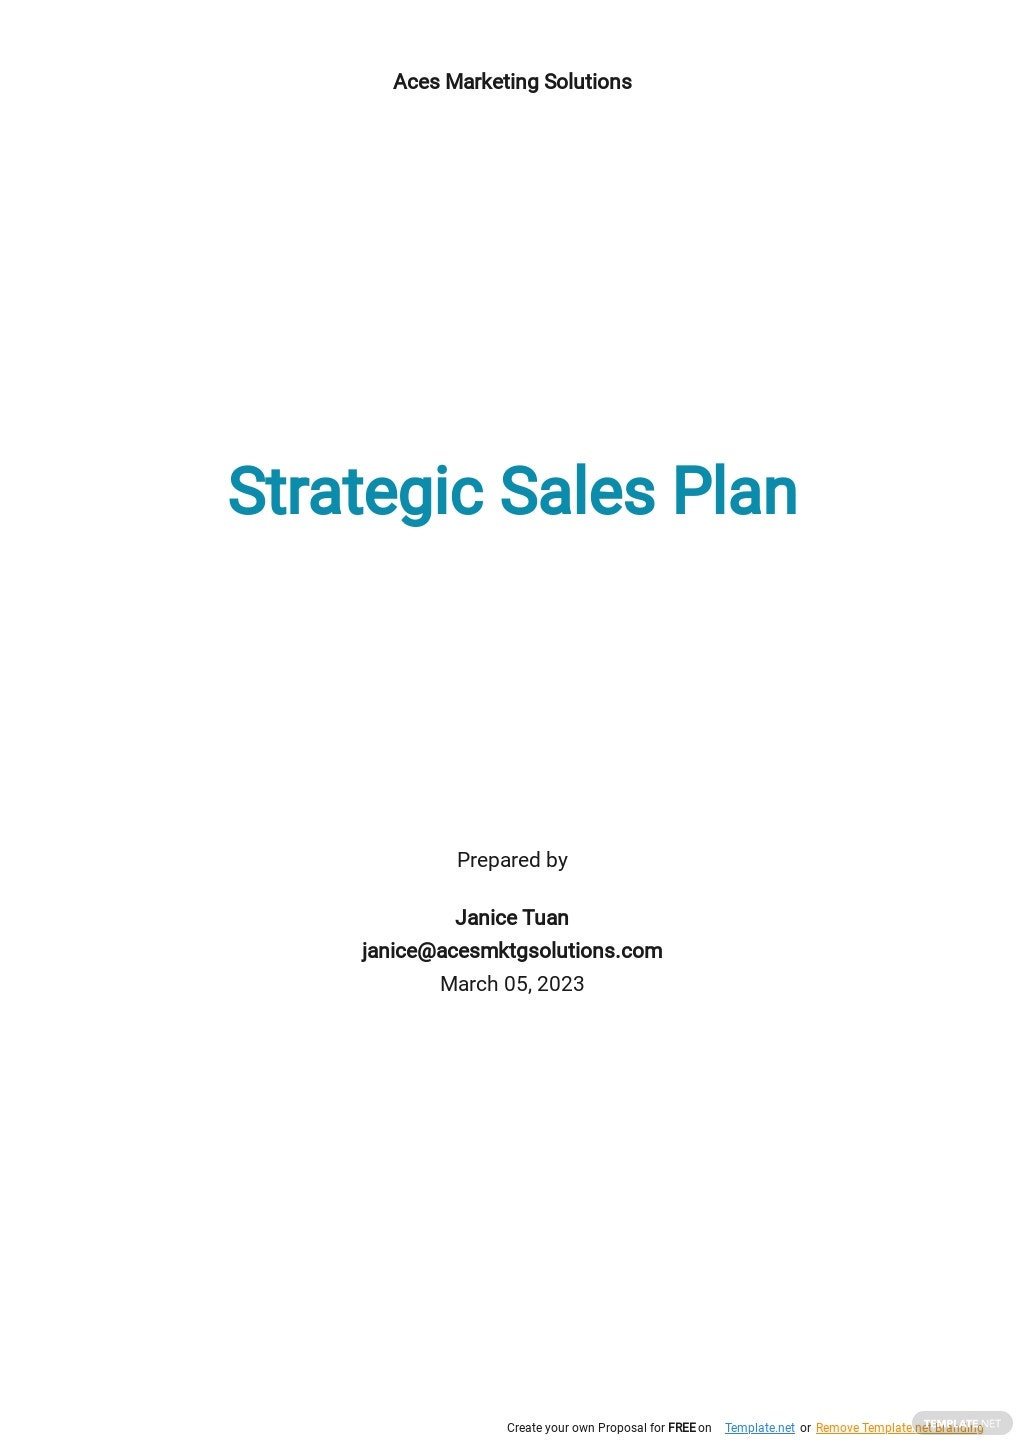 Strategic Sales Plan Template.jpe